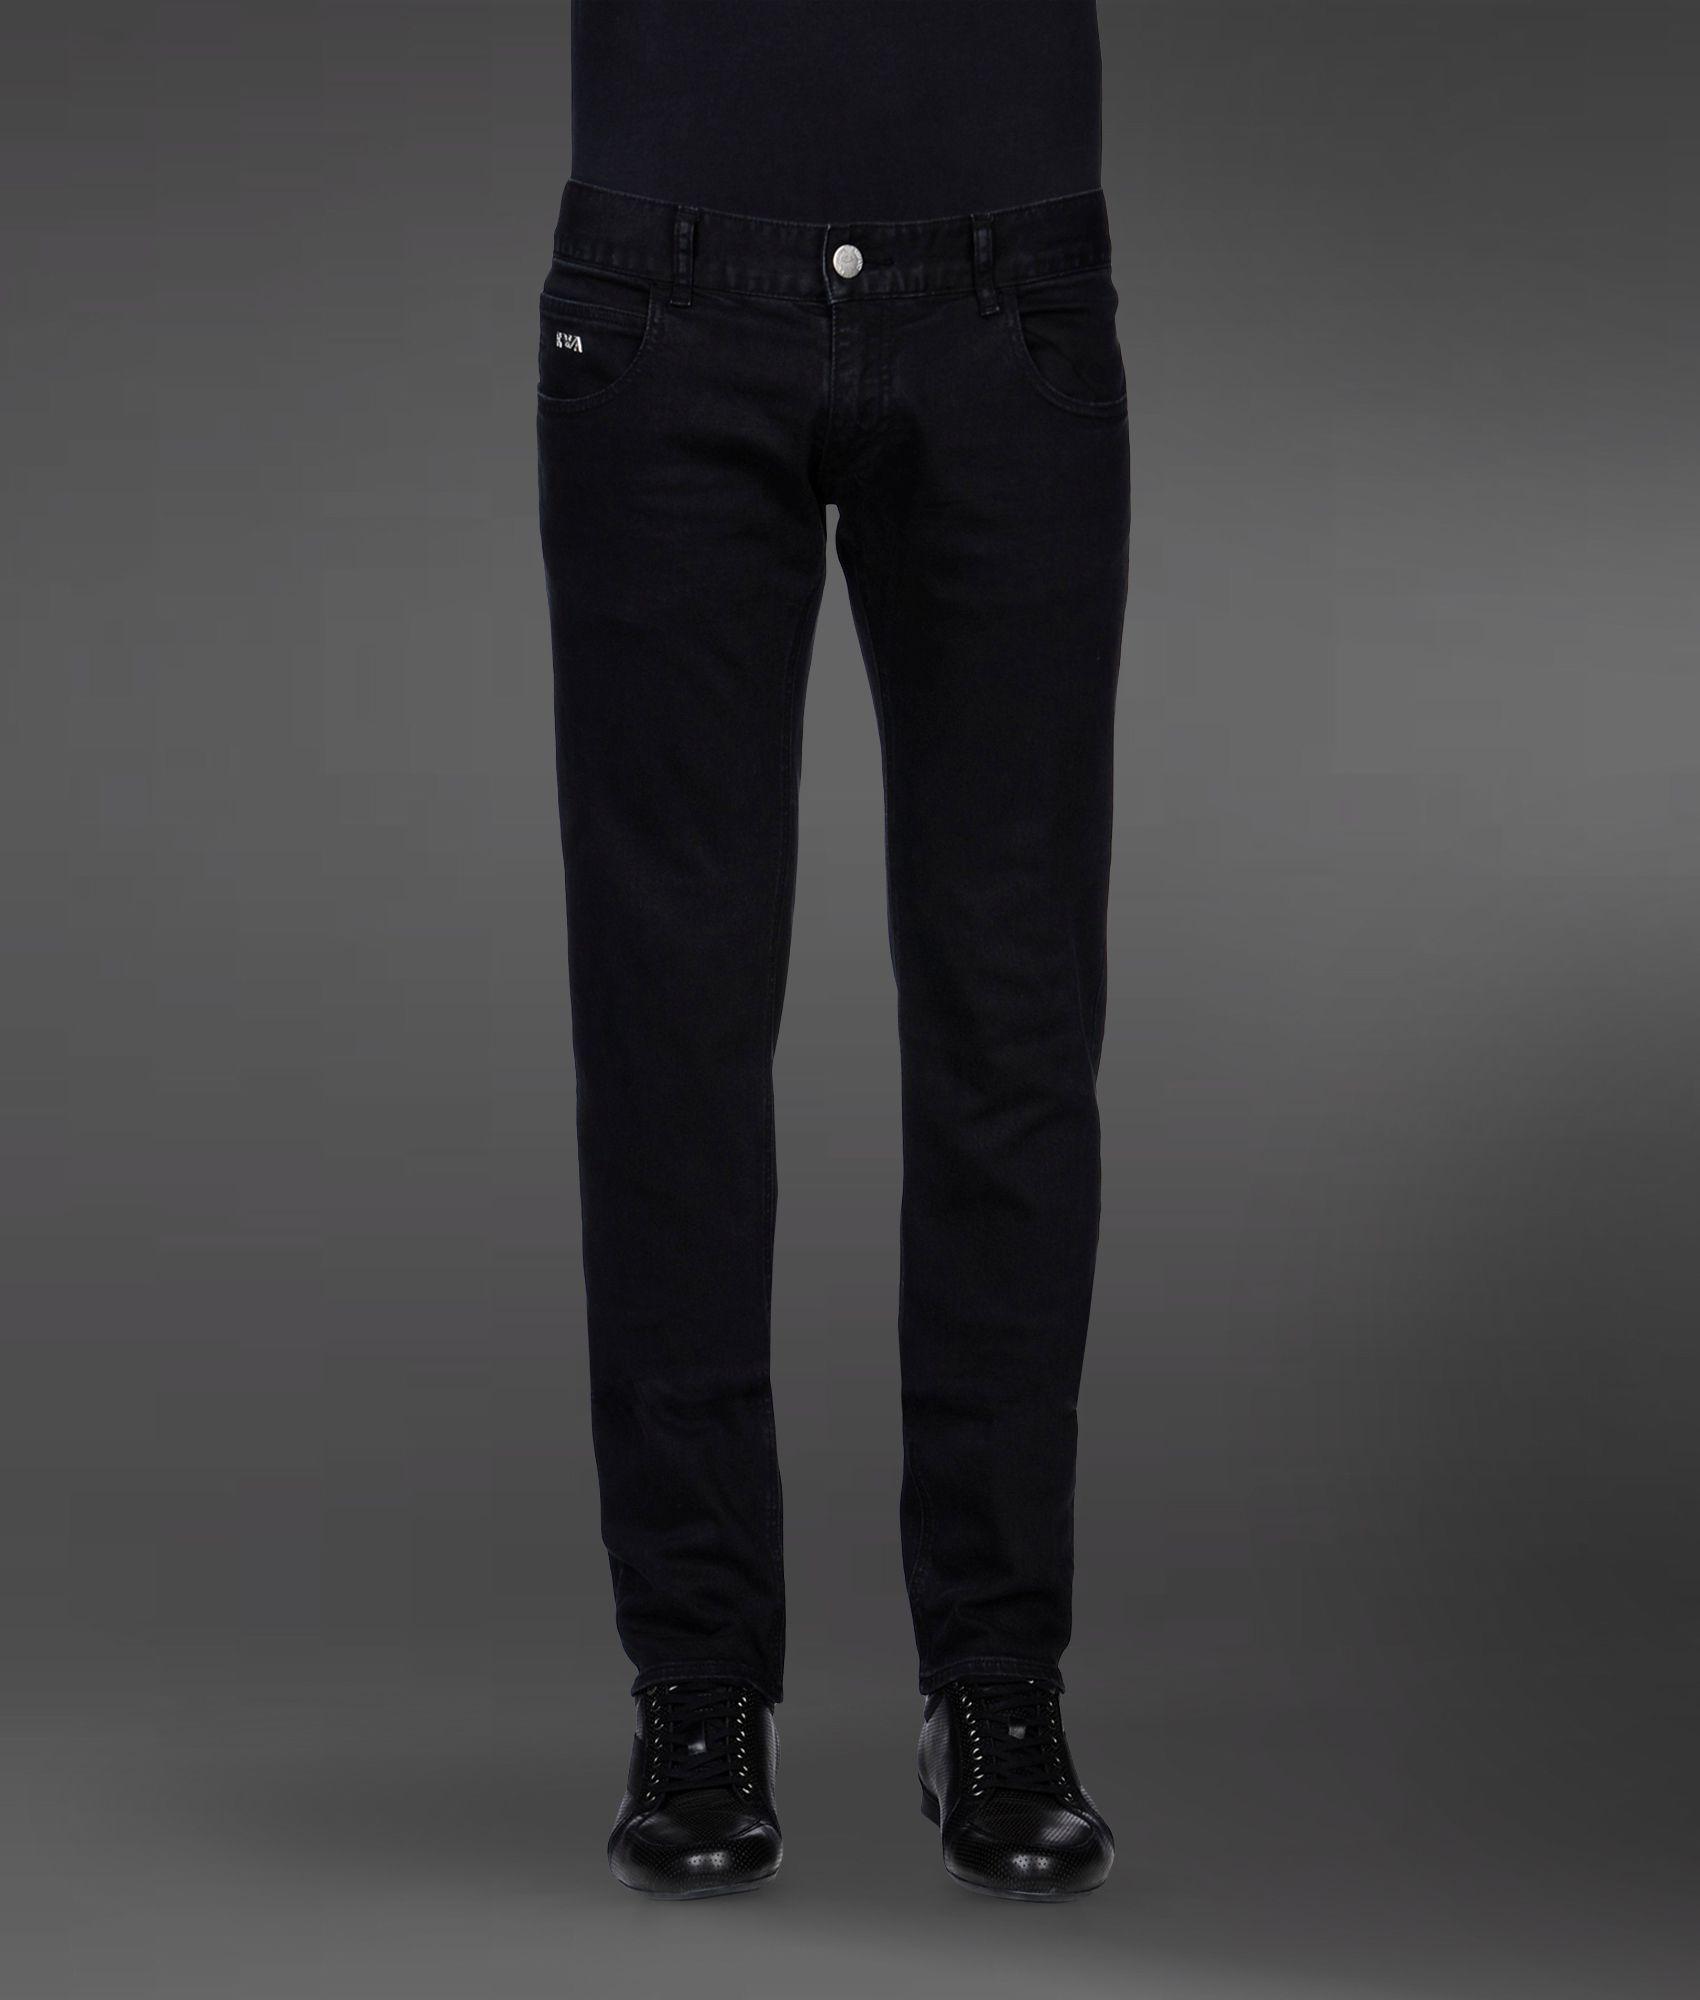 b68d02f6 Emporio Armani Jeans in Black for Men - Lyst